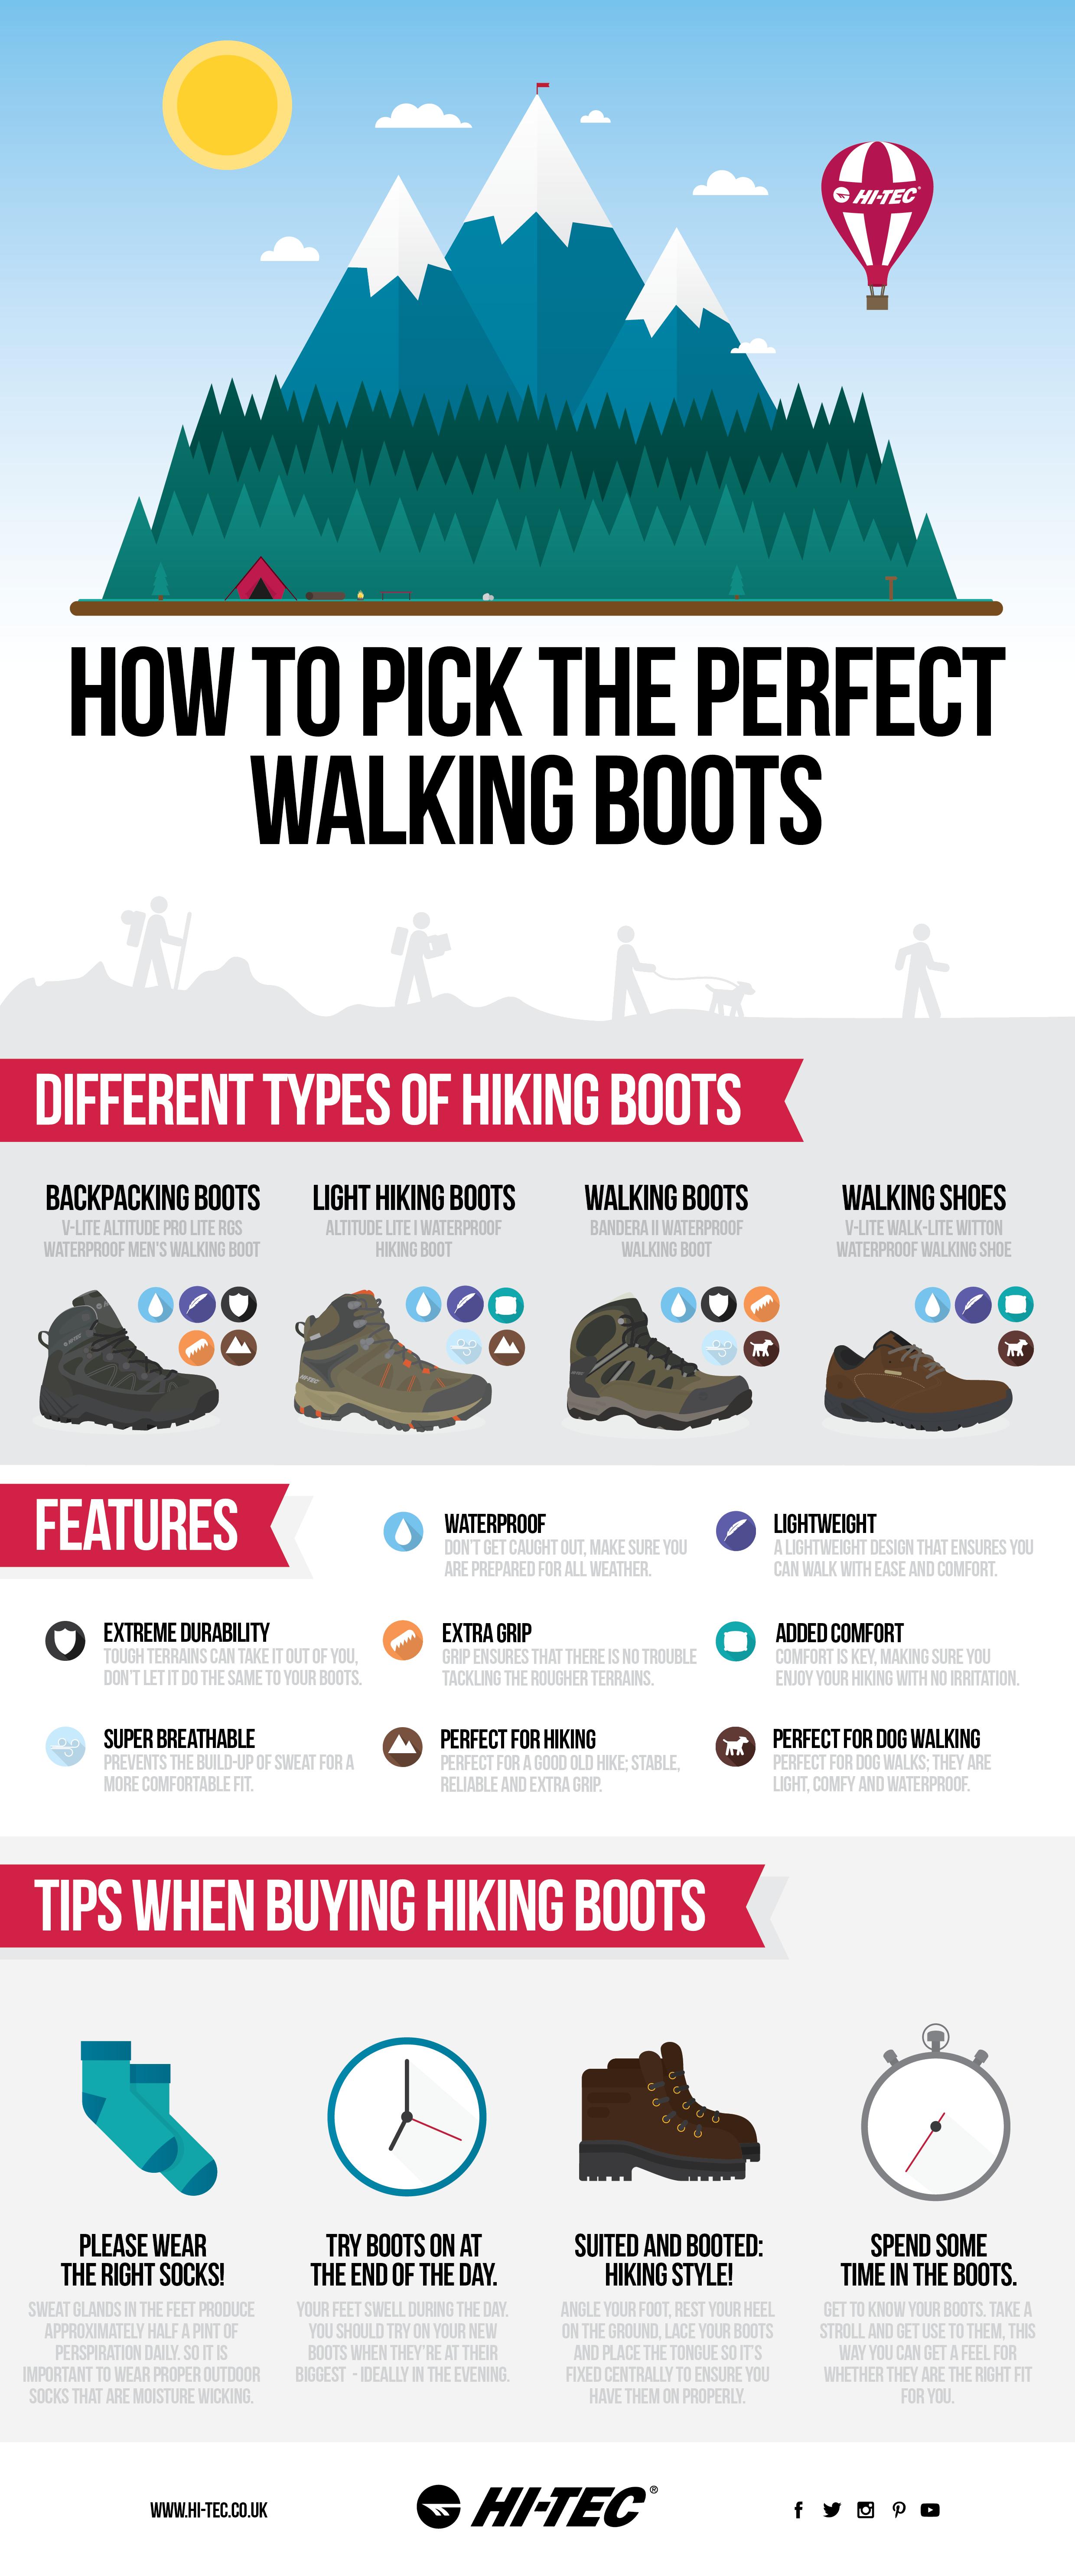 Hi-tec – How to pick the perfect walking boots